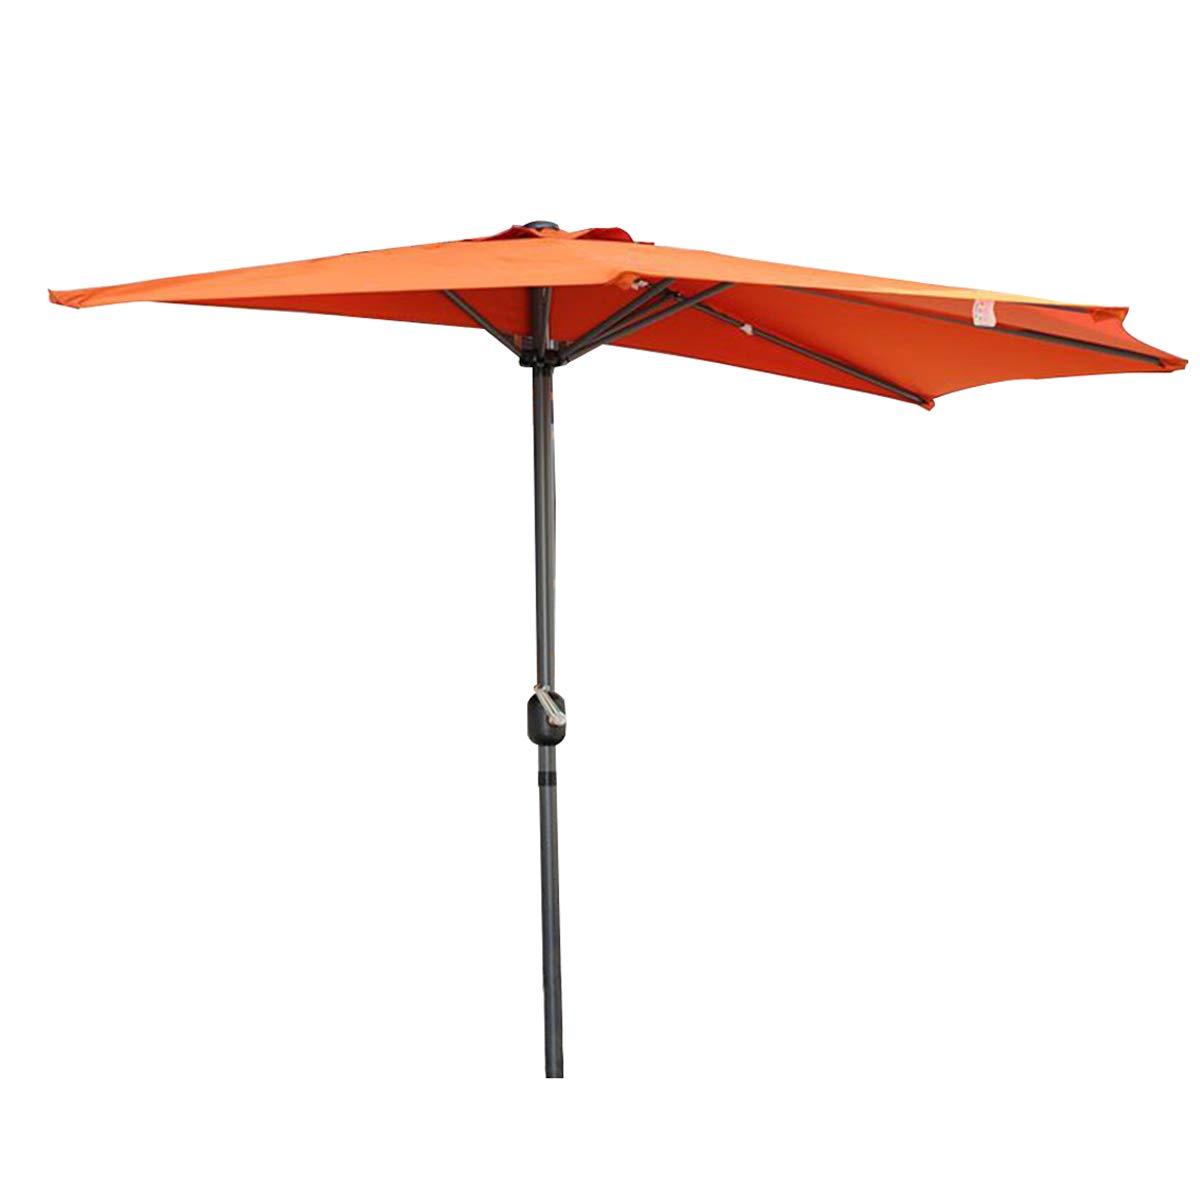 Angel Living 5814770 Garden Patio Balcony Half Round 270cm Aluminum Parasol Sun Shade Semi Round Umbrella (Apple Green)